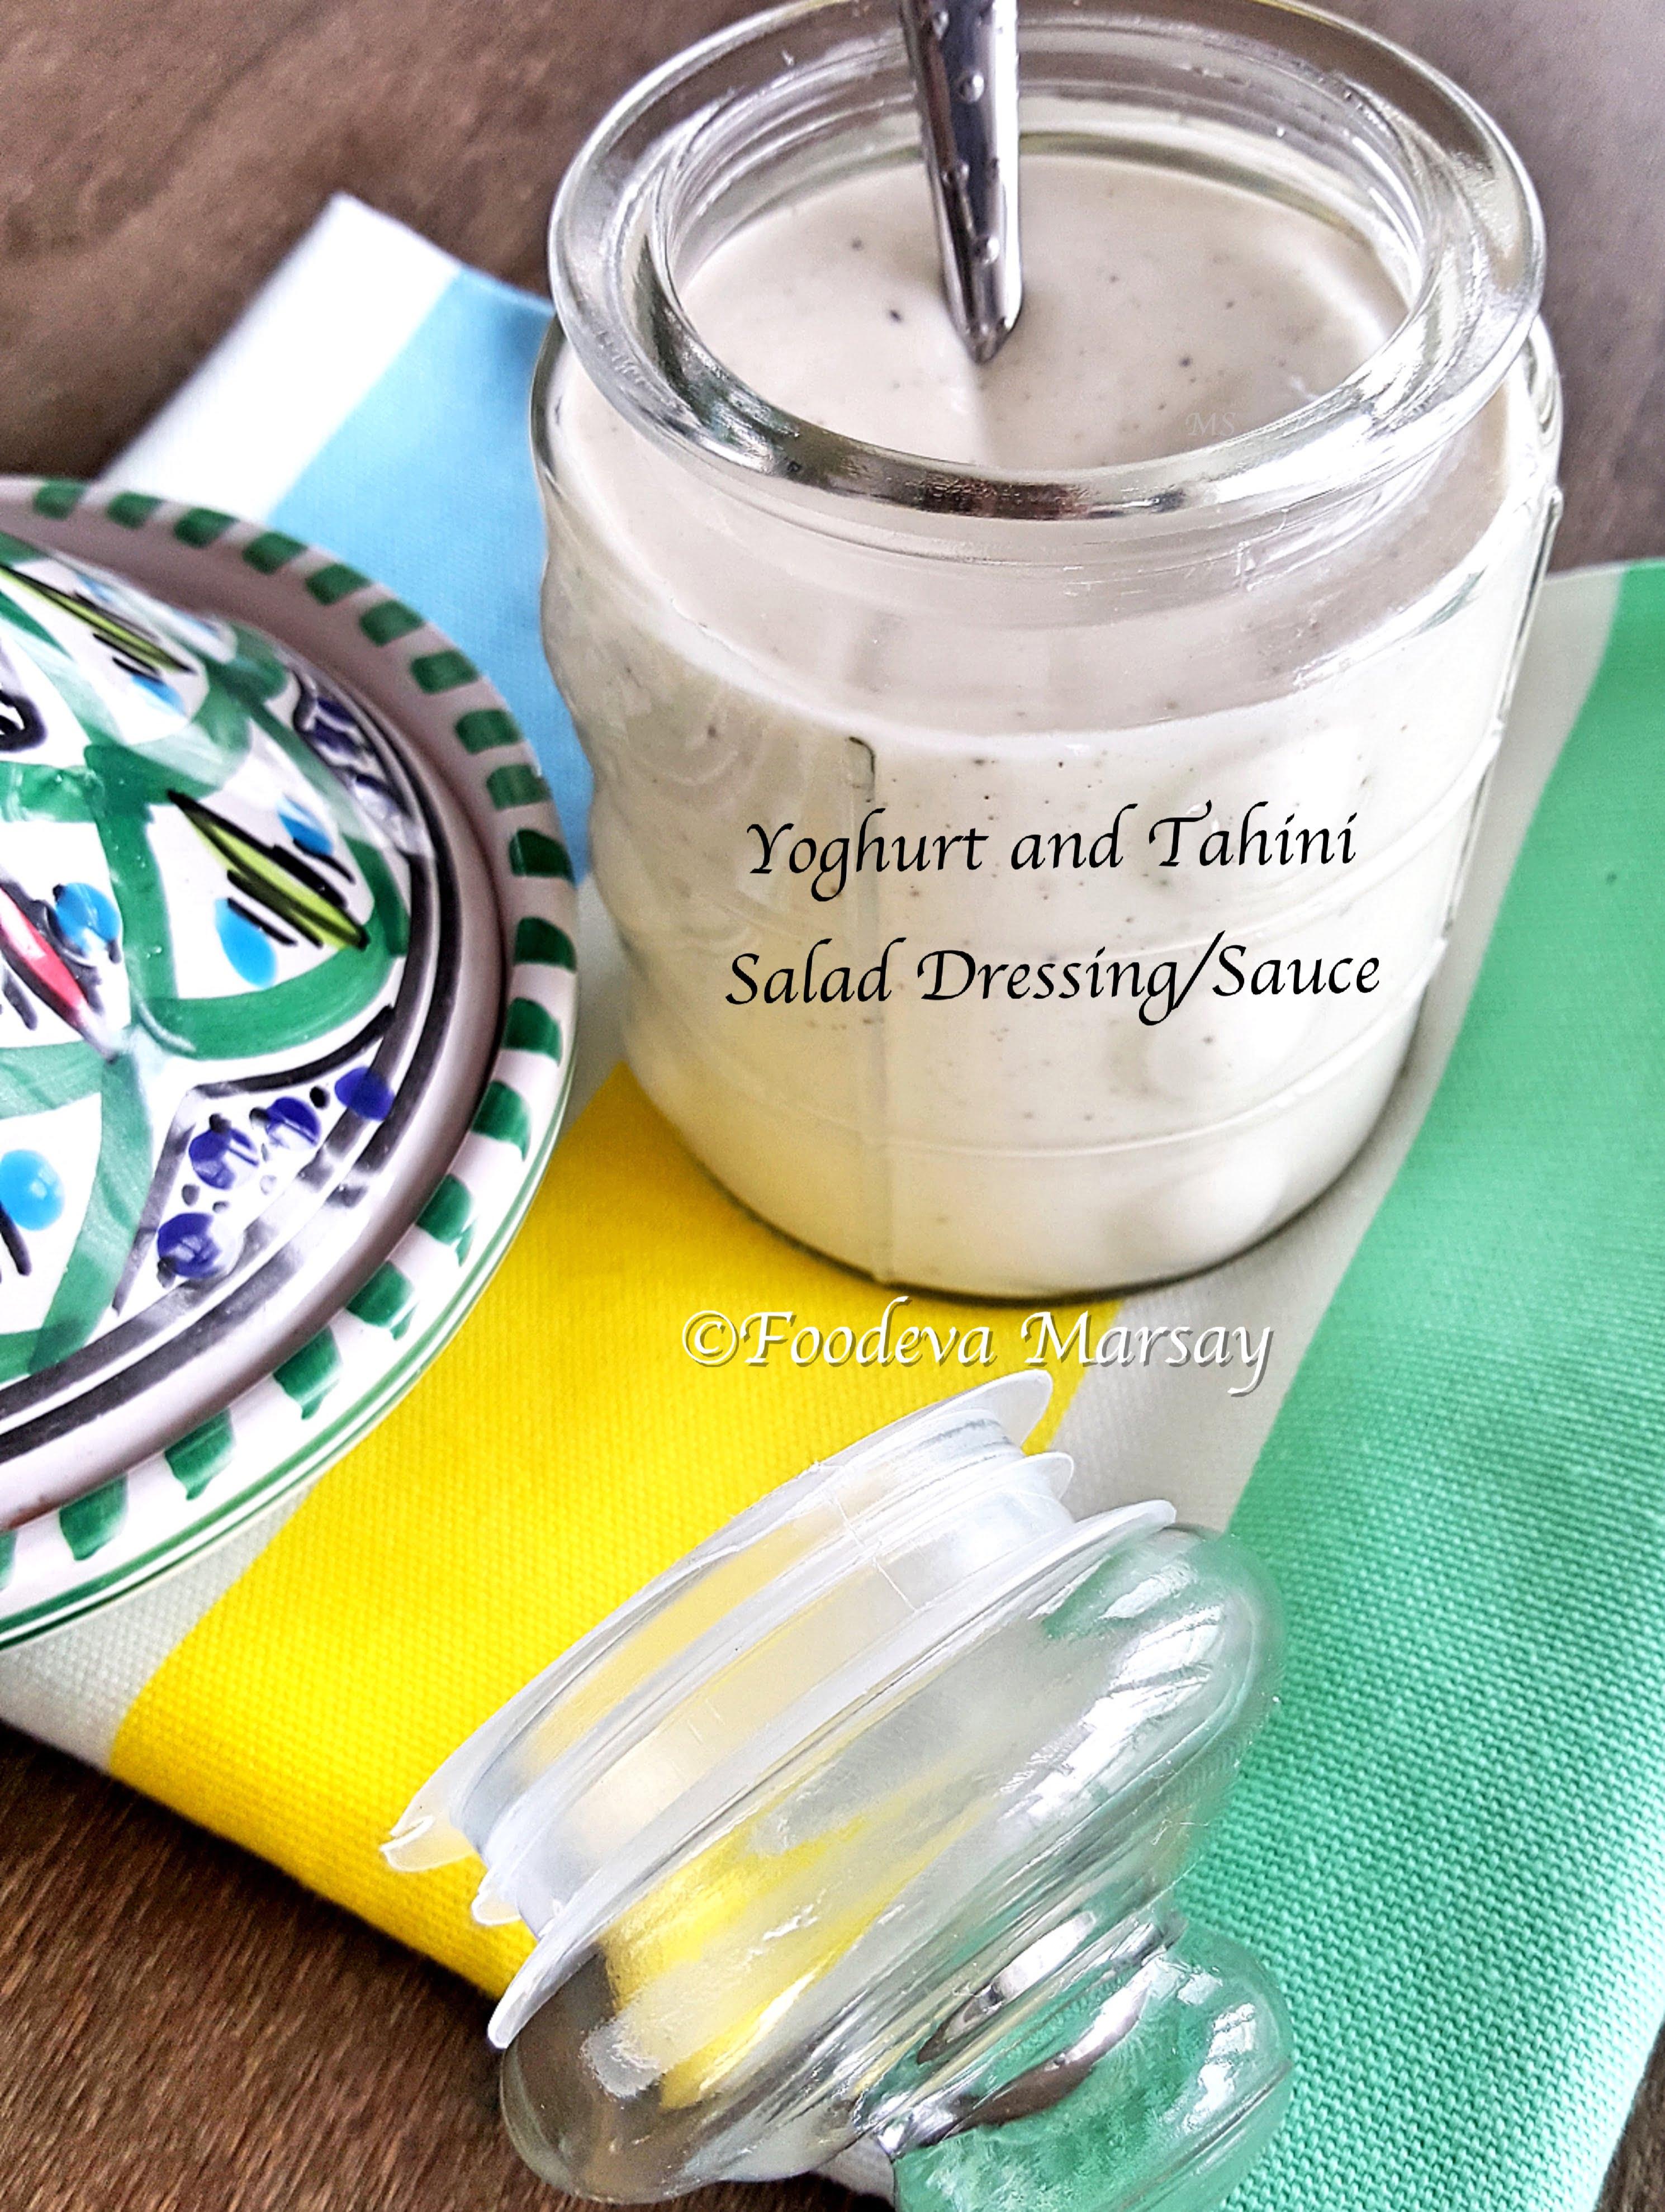 Yoghurt and Tahini Dressing/Sauce